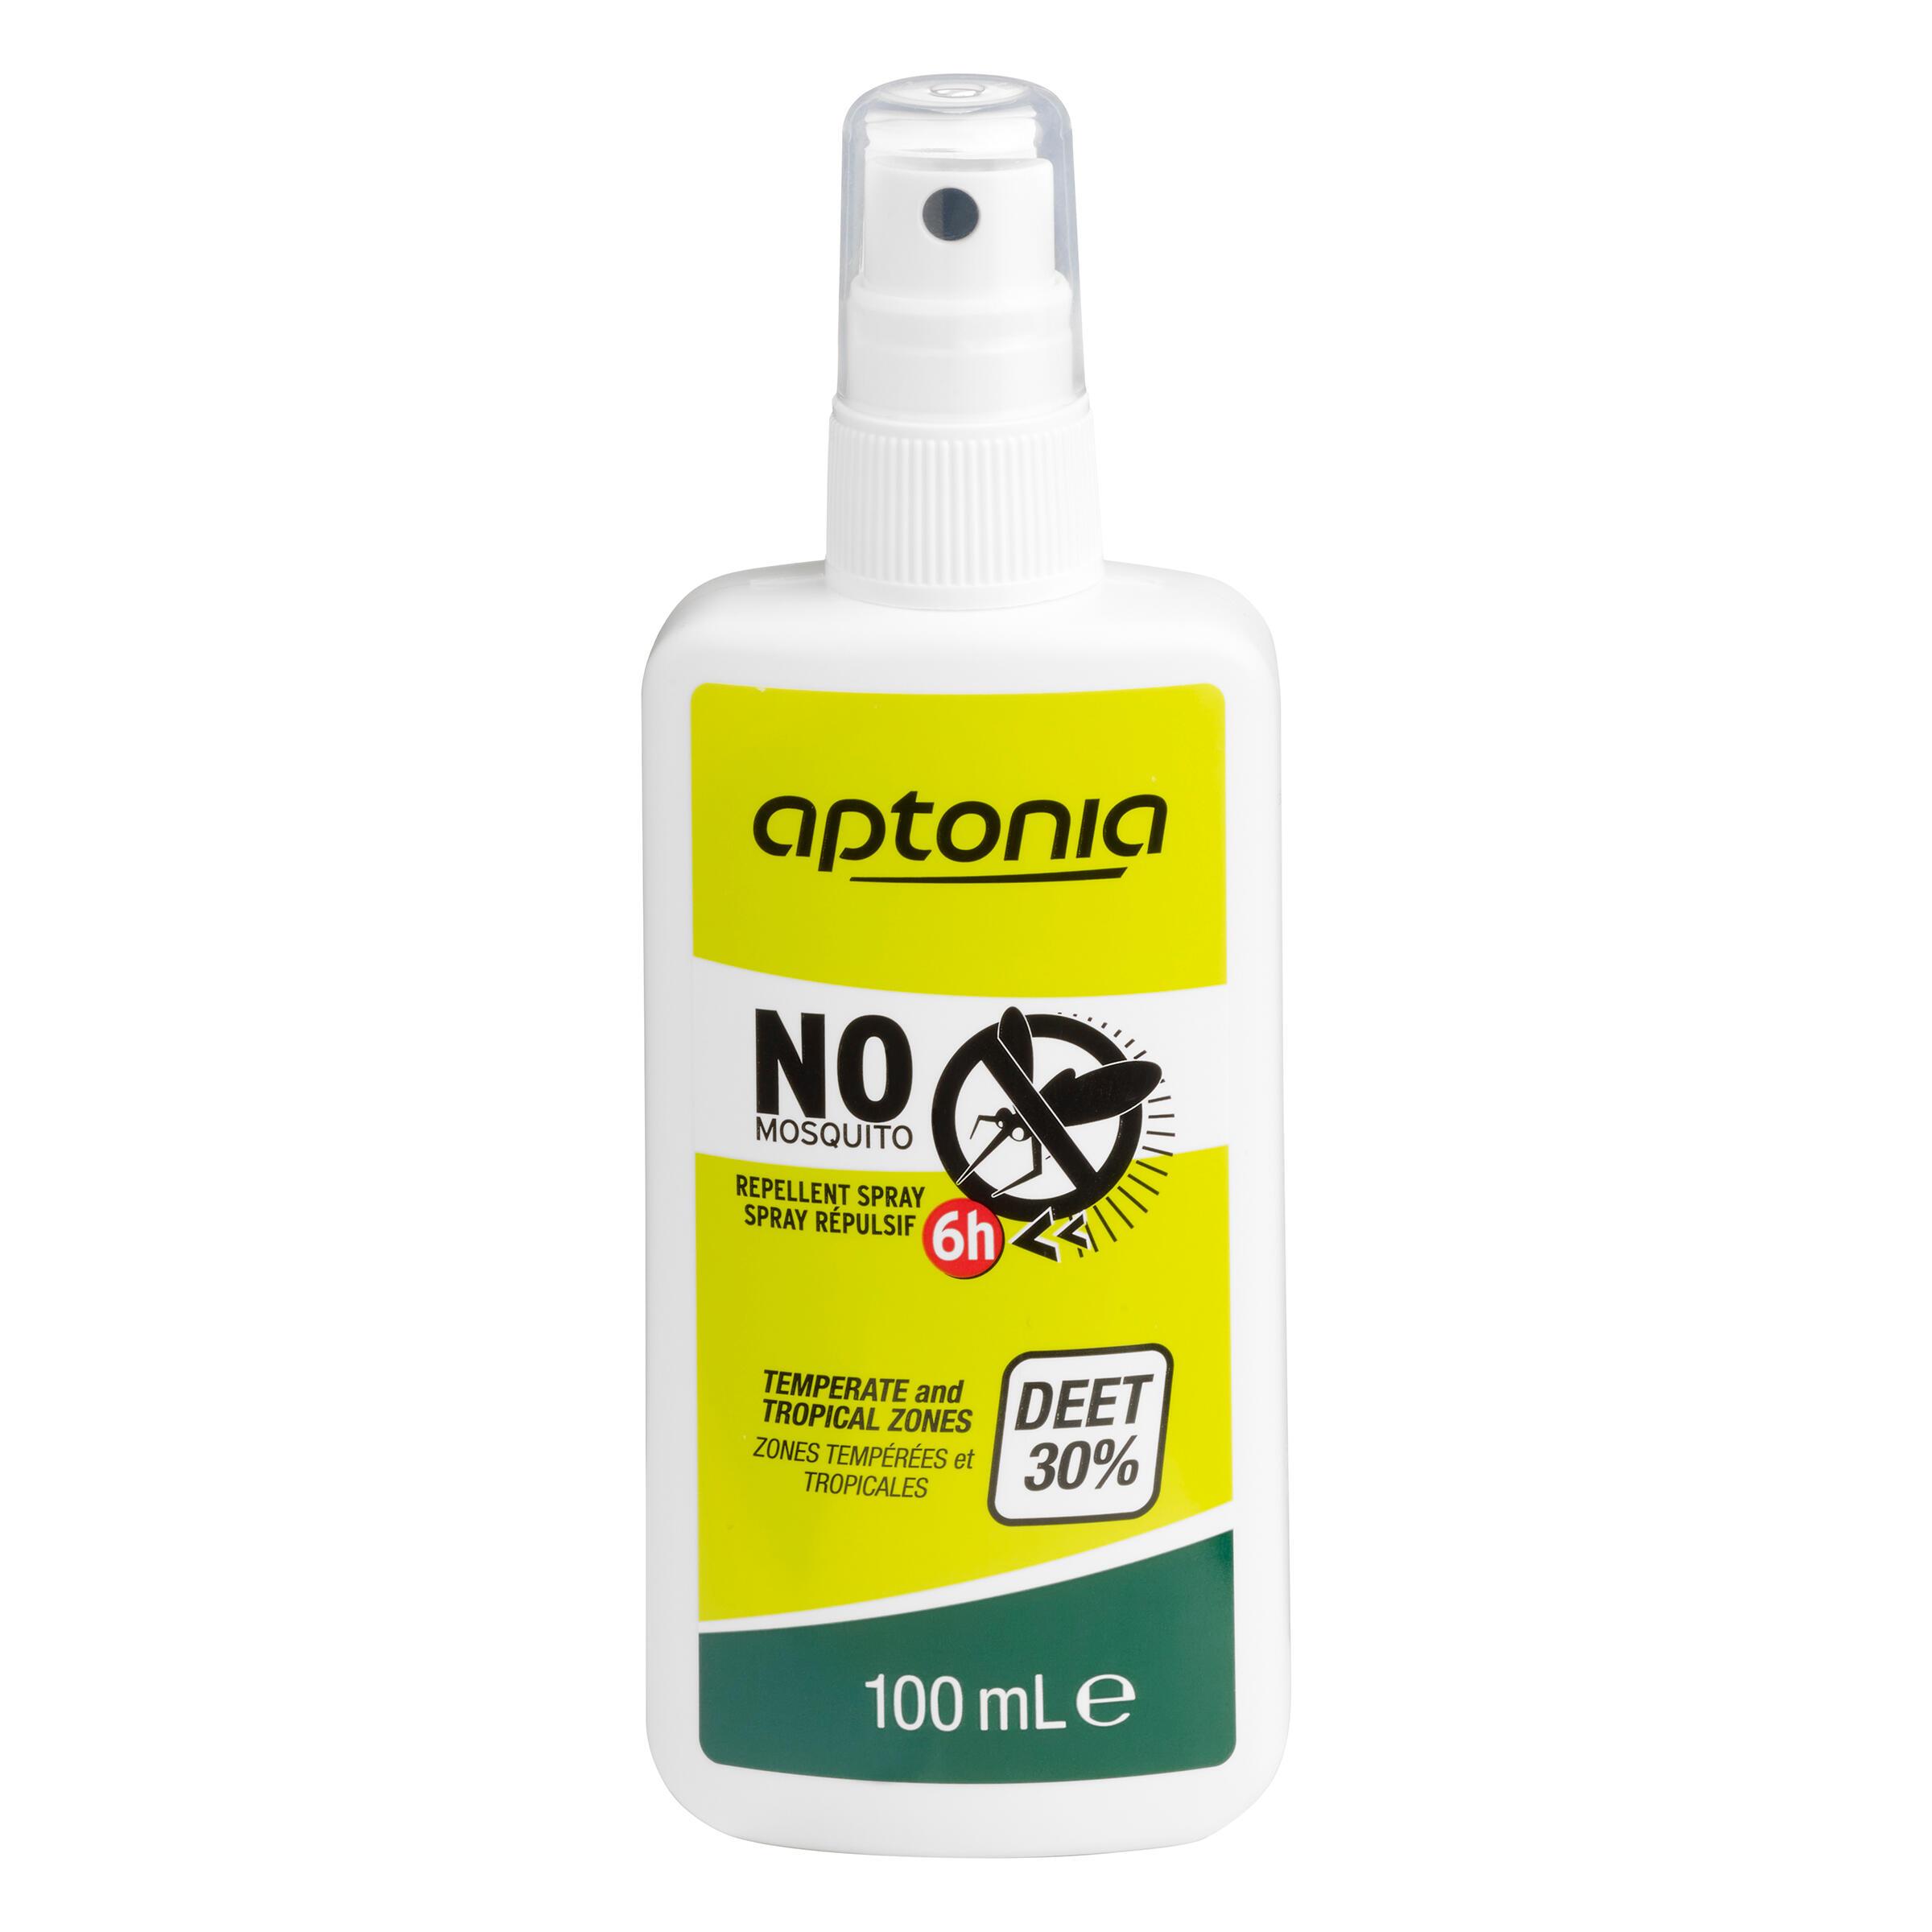 forclaz antizanzare deet 30% - 100 ml.